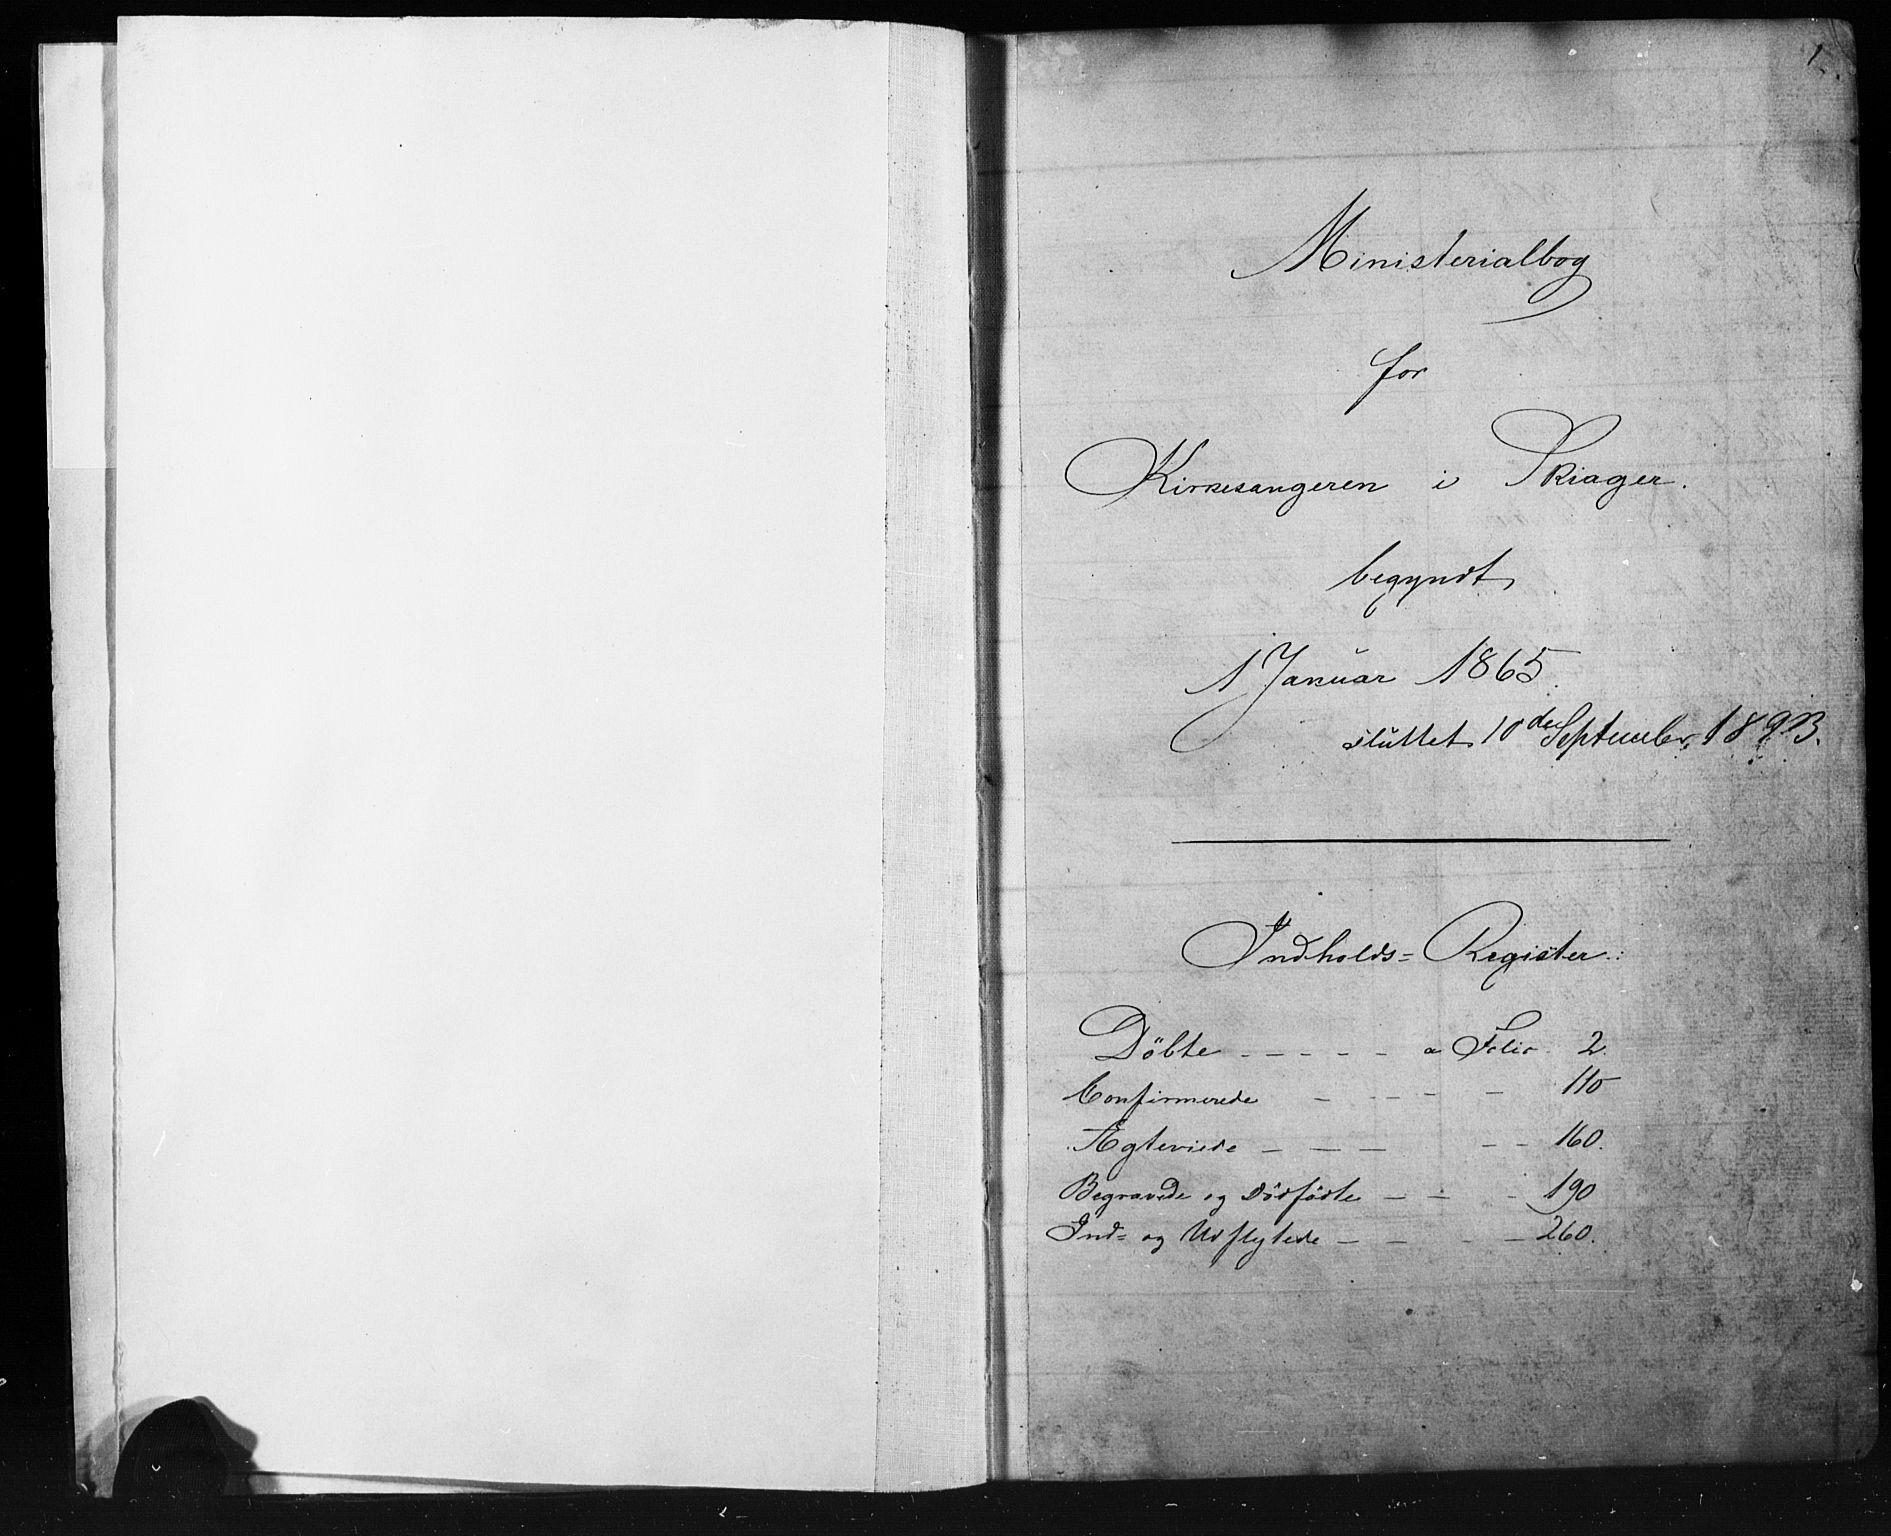 SAH, Skjåk prestekontor, Klokkerbok nr. 1, 1865-1893, s. 1